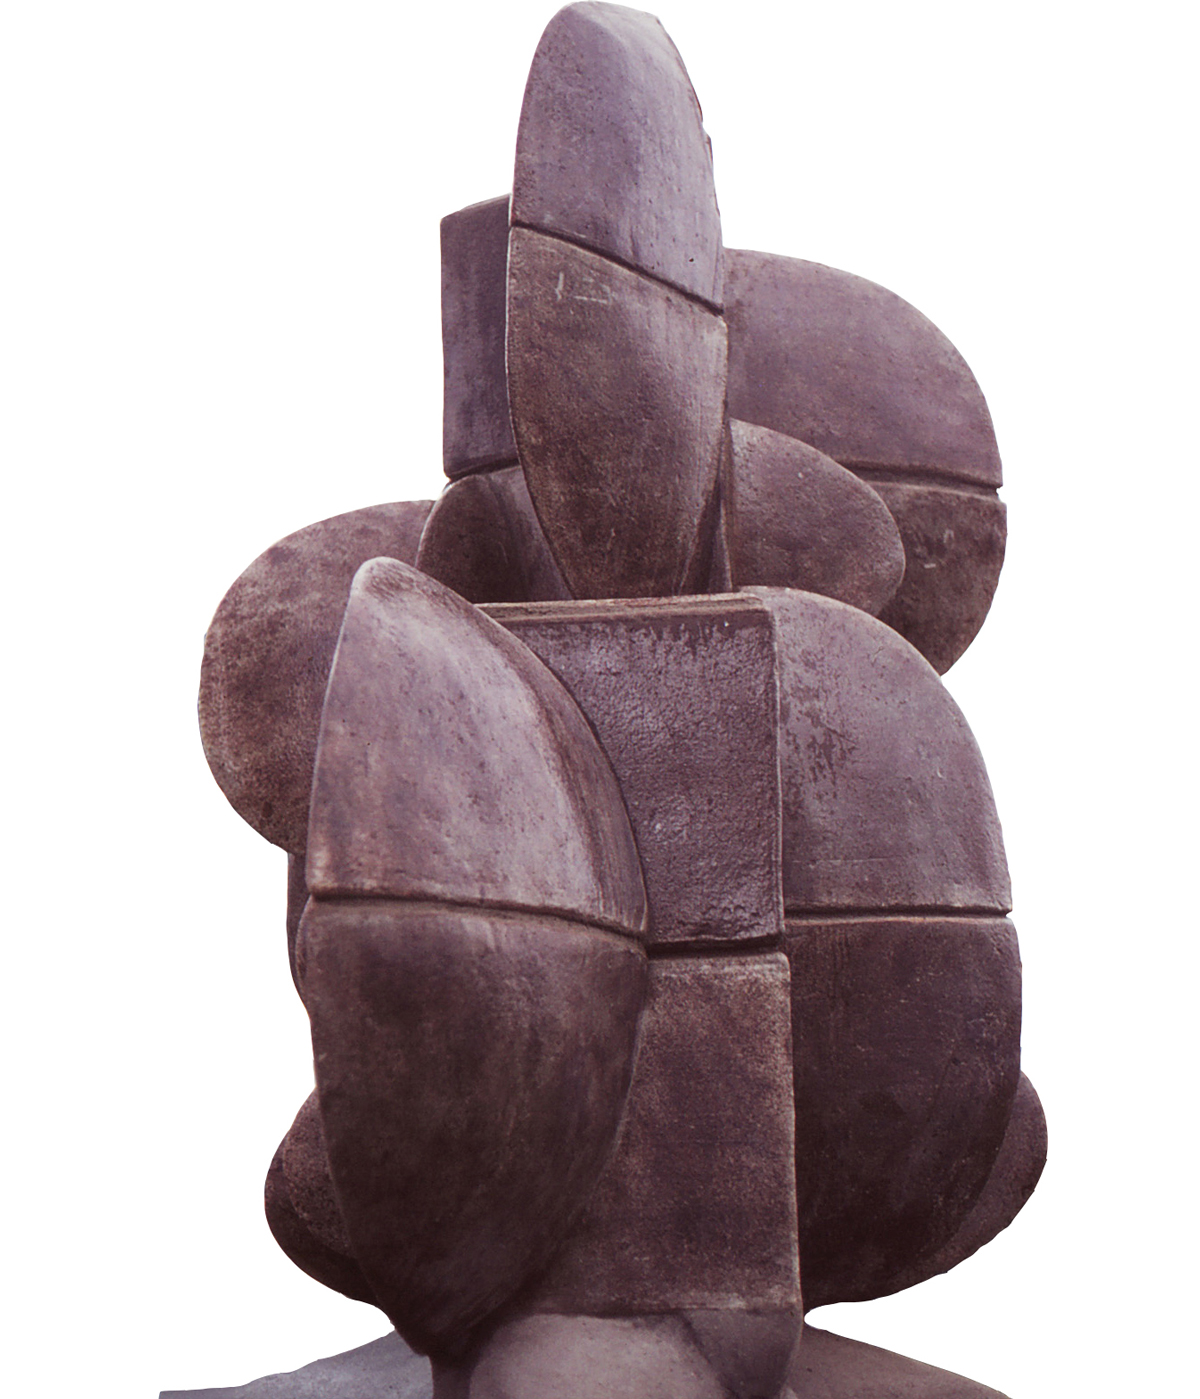 hirlet-ceramique-sculptures-limoges